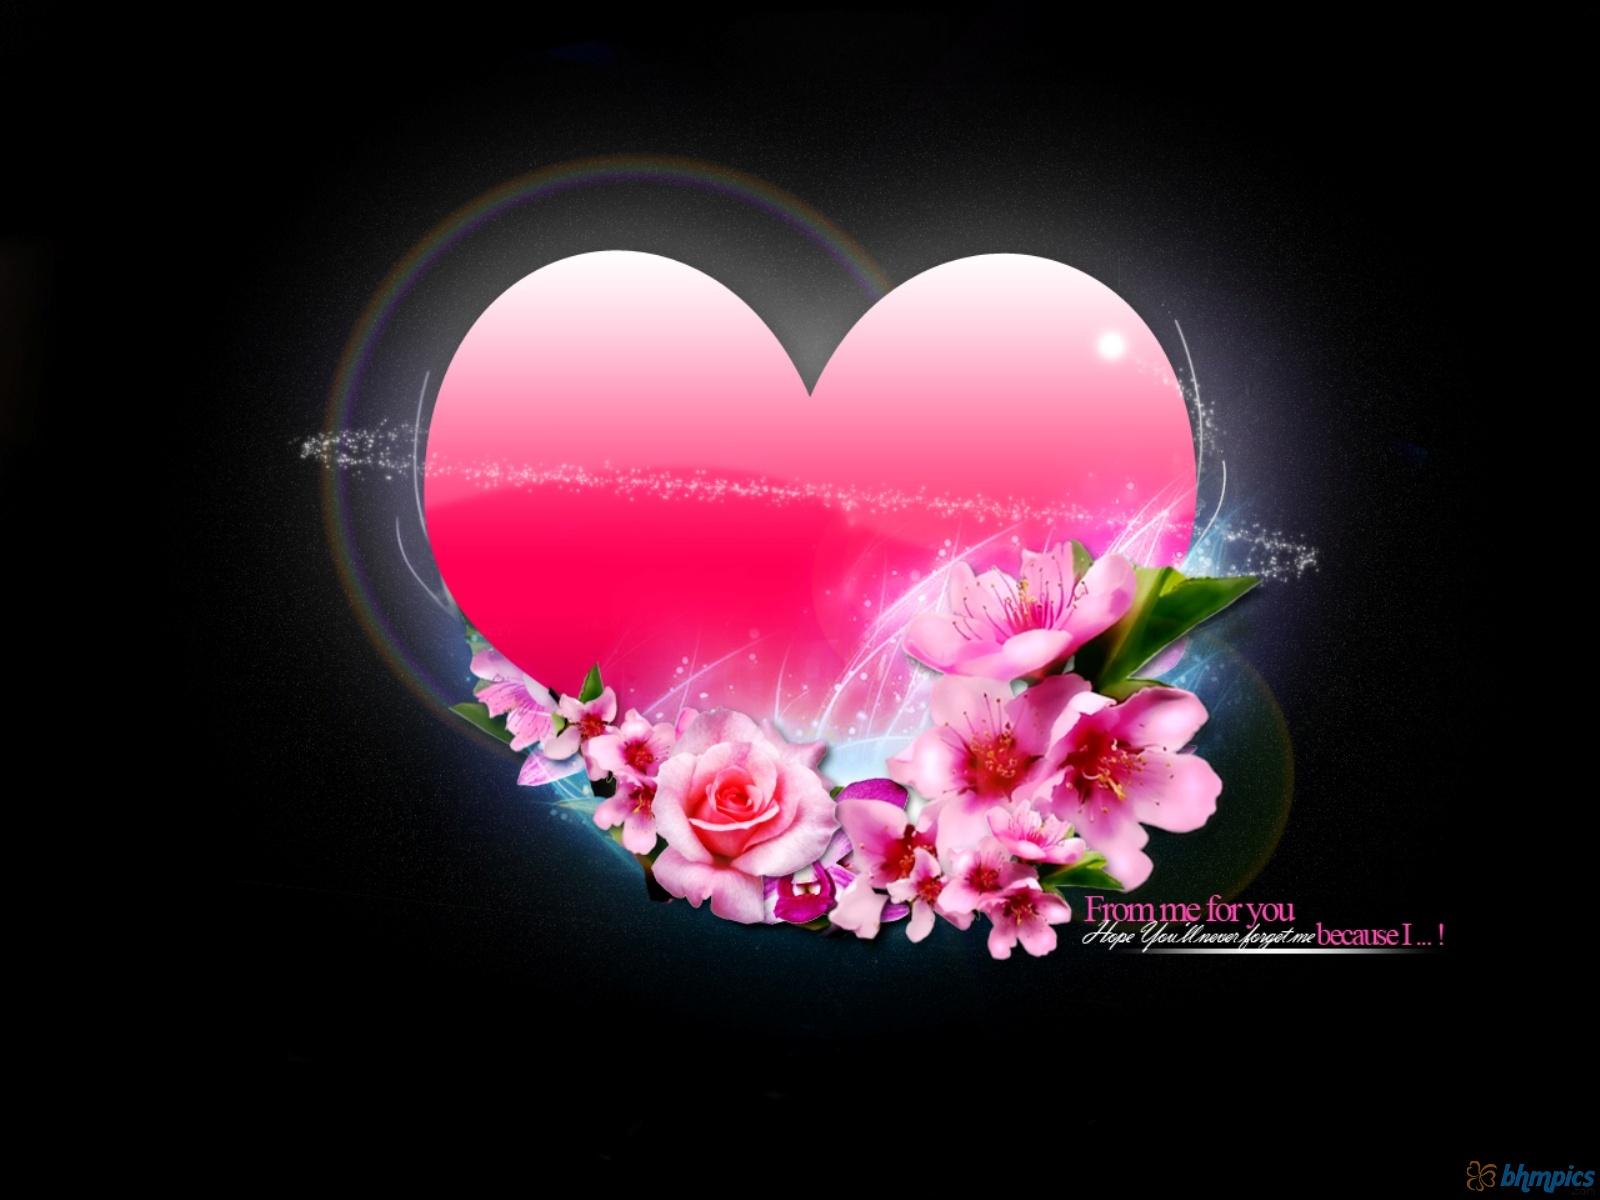 http://4.bp.blogspot.com/-VlkfbSwRfEg/TuhOBuJiKzI/AAAAAAAAAkk/GoclJ1Sa3Ds/s1600/african_violets_silk_flowers-1600x1200.jpg